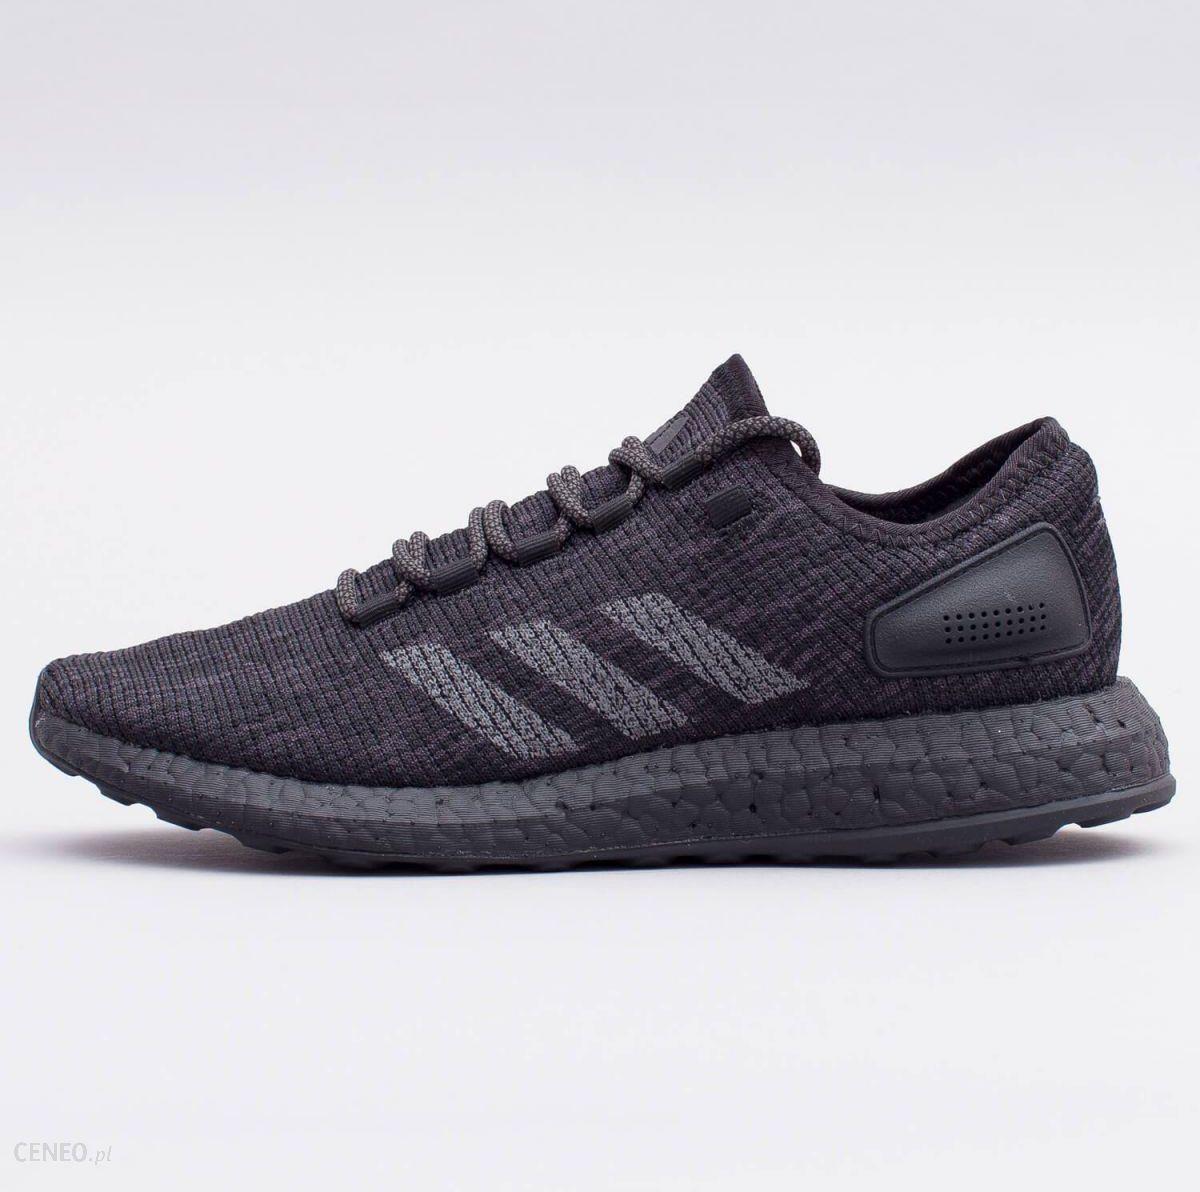 Adidas Pureboost X Trainer 30